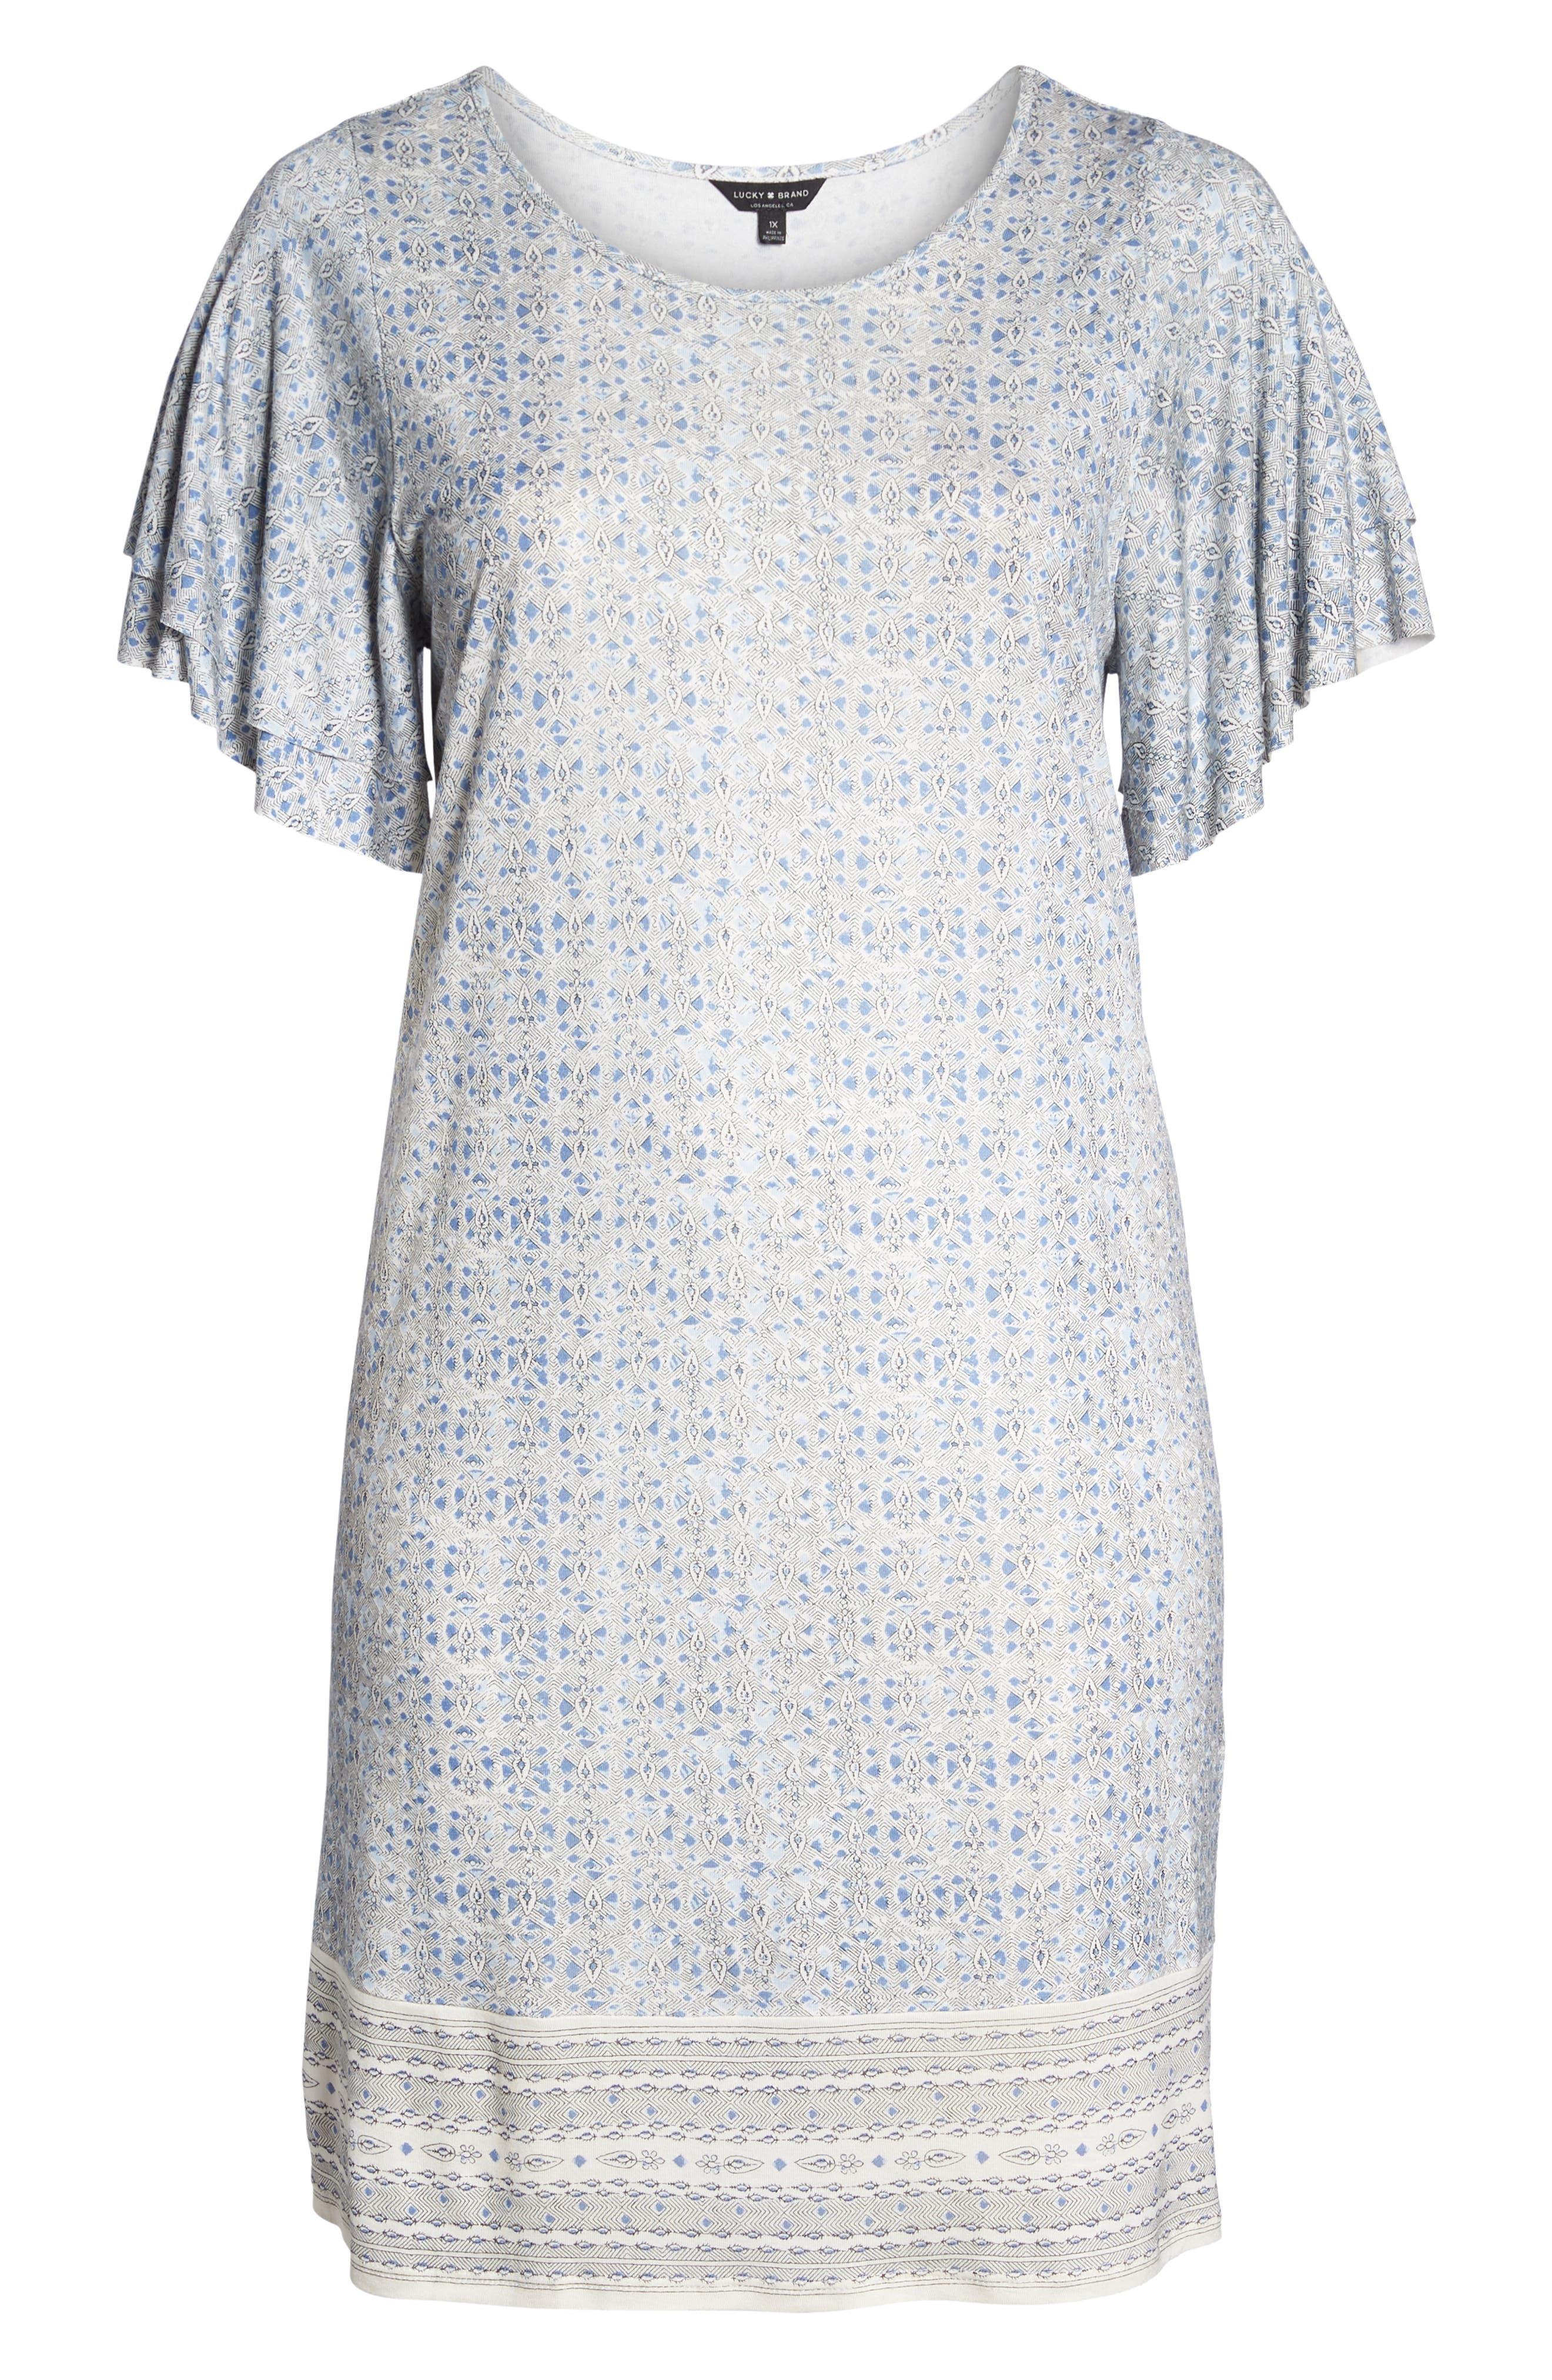 Ruffle Sleeve Print Shift Dress,                             Alternate thumbnail 6, color,                             Blue Multi